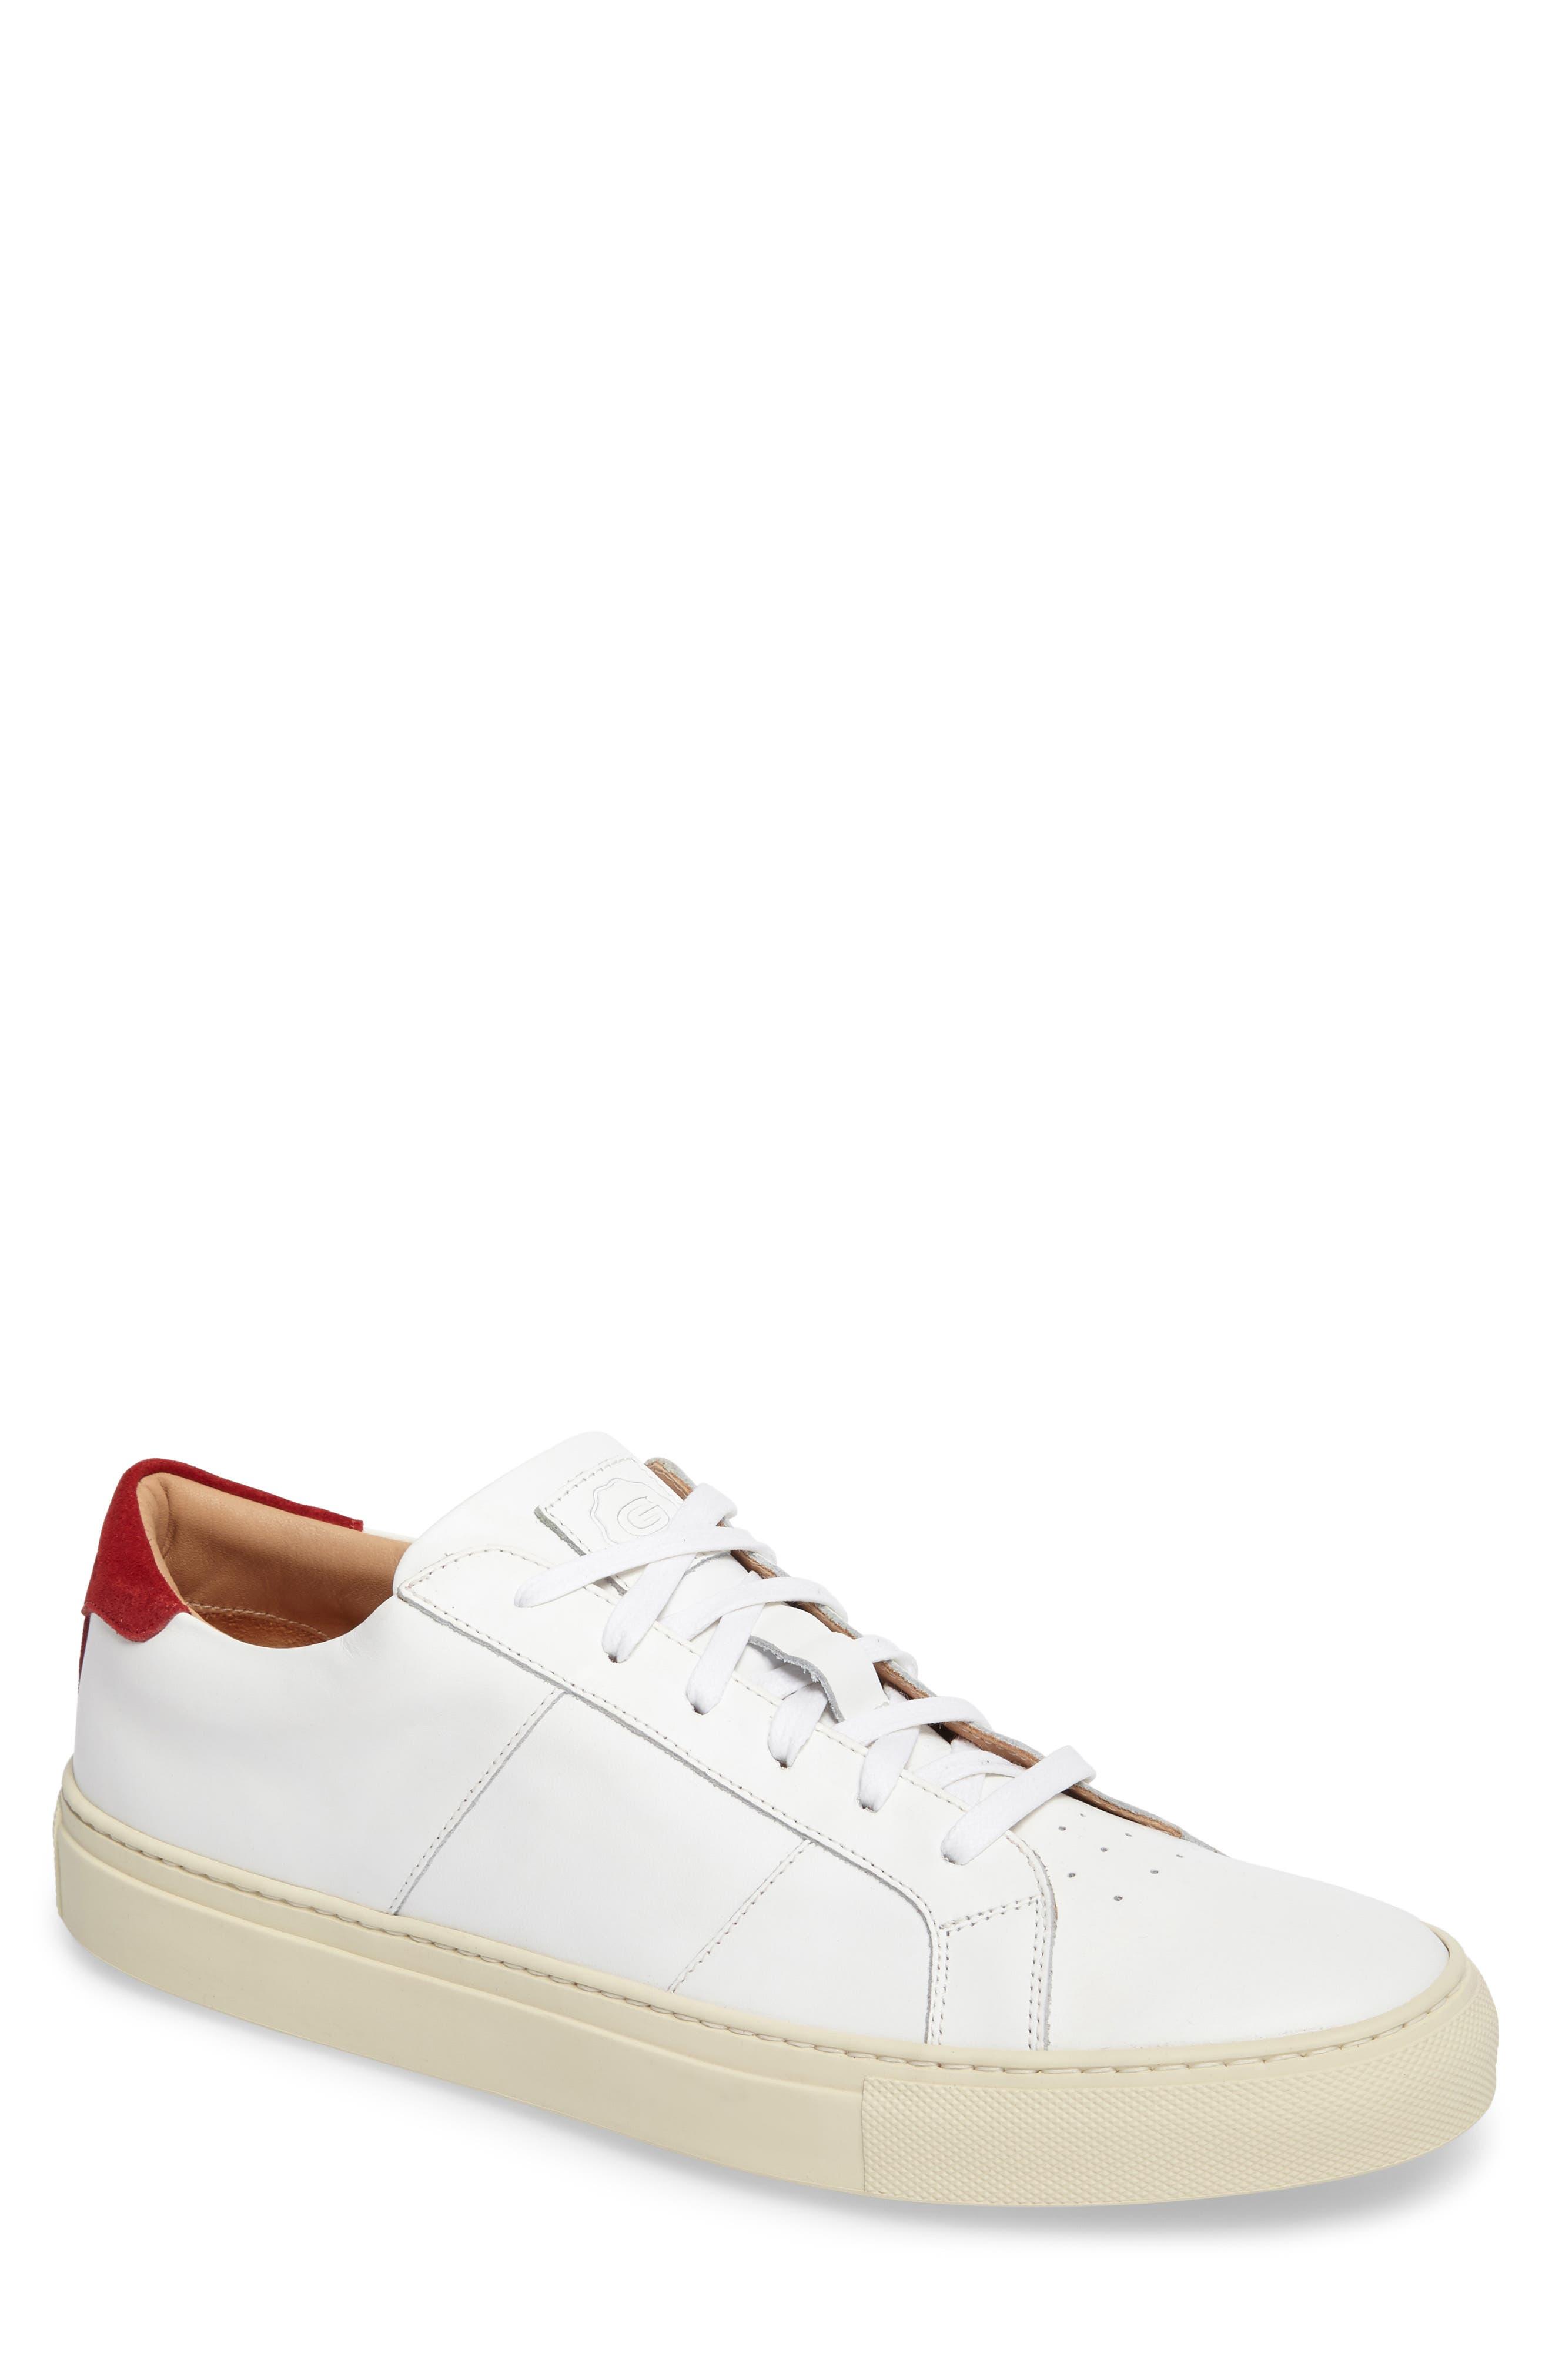 Alternate Image 1 Selected - Greats Royale Vintage Low Top Sneaker (Men) (Nordstrom Exclusive)